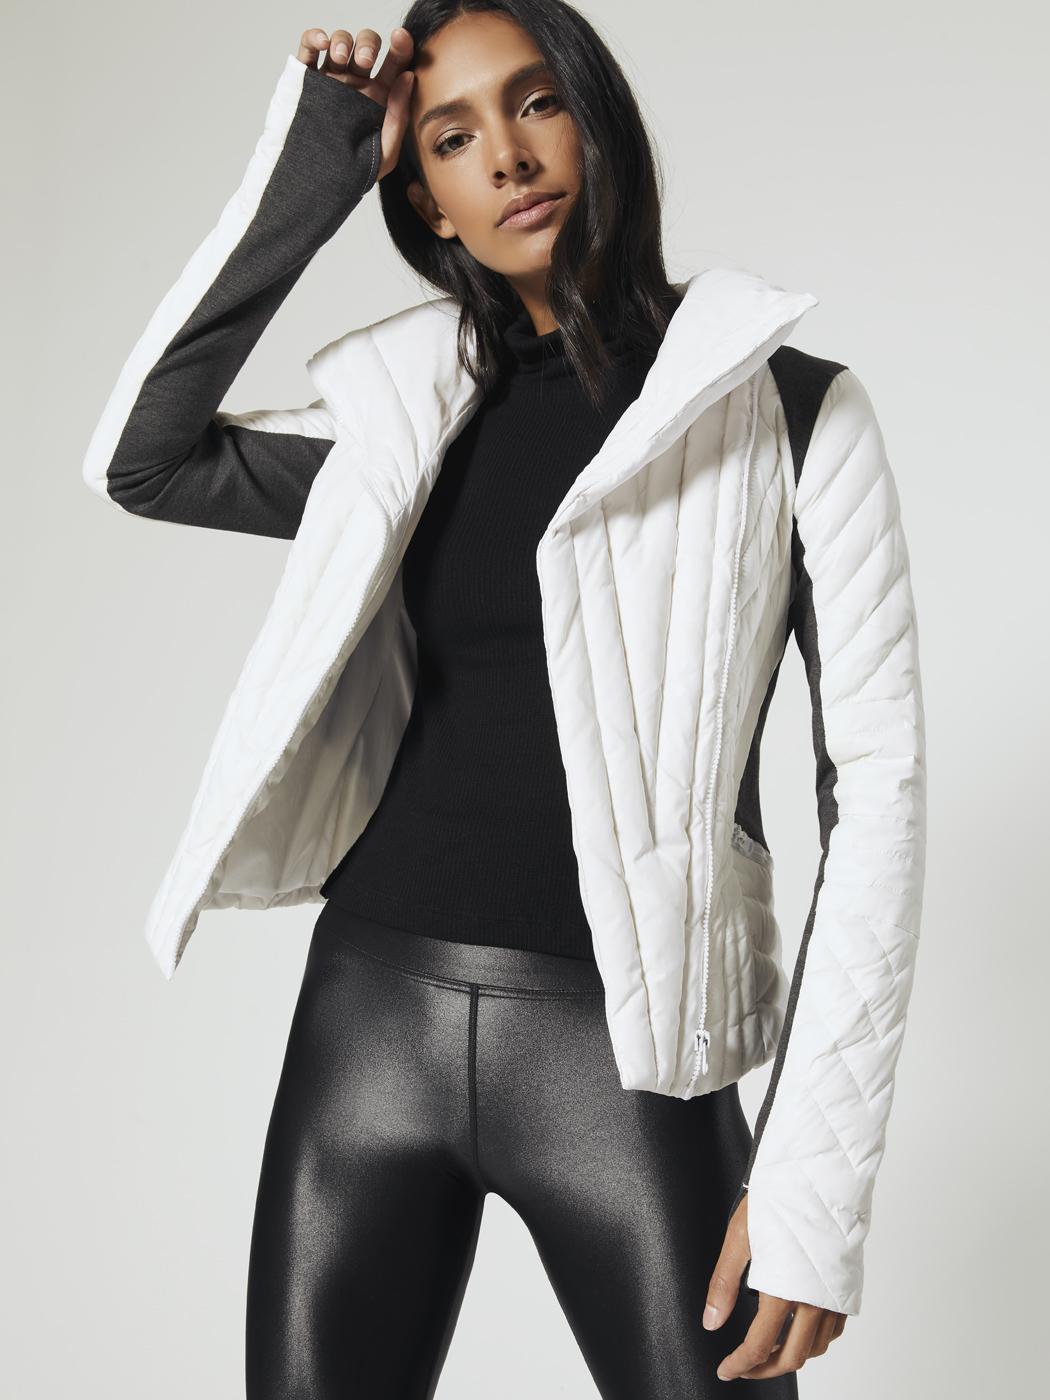 Motion Panel Puffer Jacket In White By Blanc Noir From Carbon38 Cutout Bra Lycra Leggings Best Leggings [ 1400 x 1050 Pixel ]